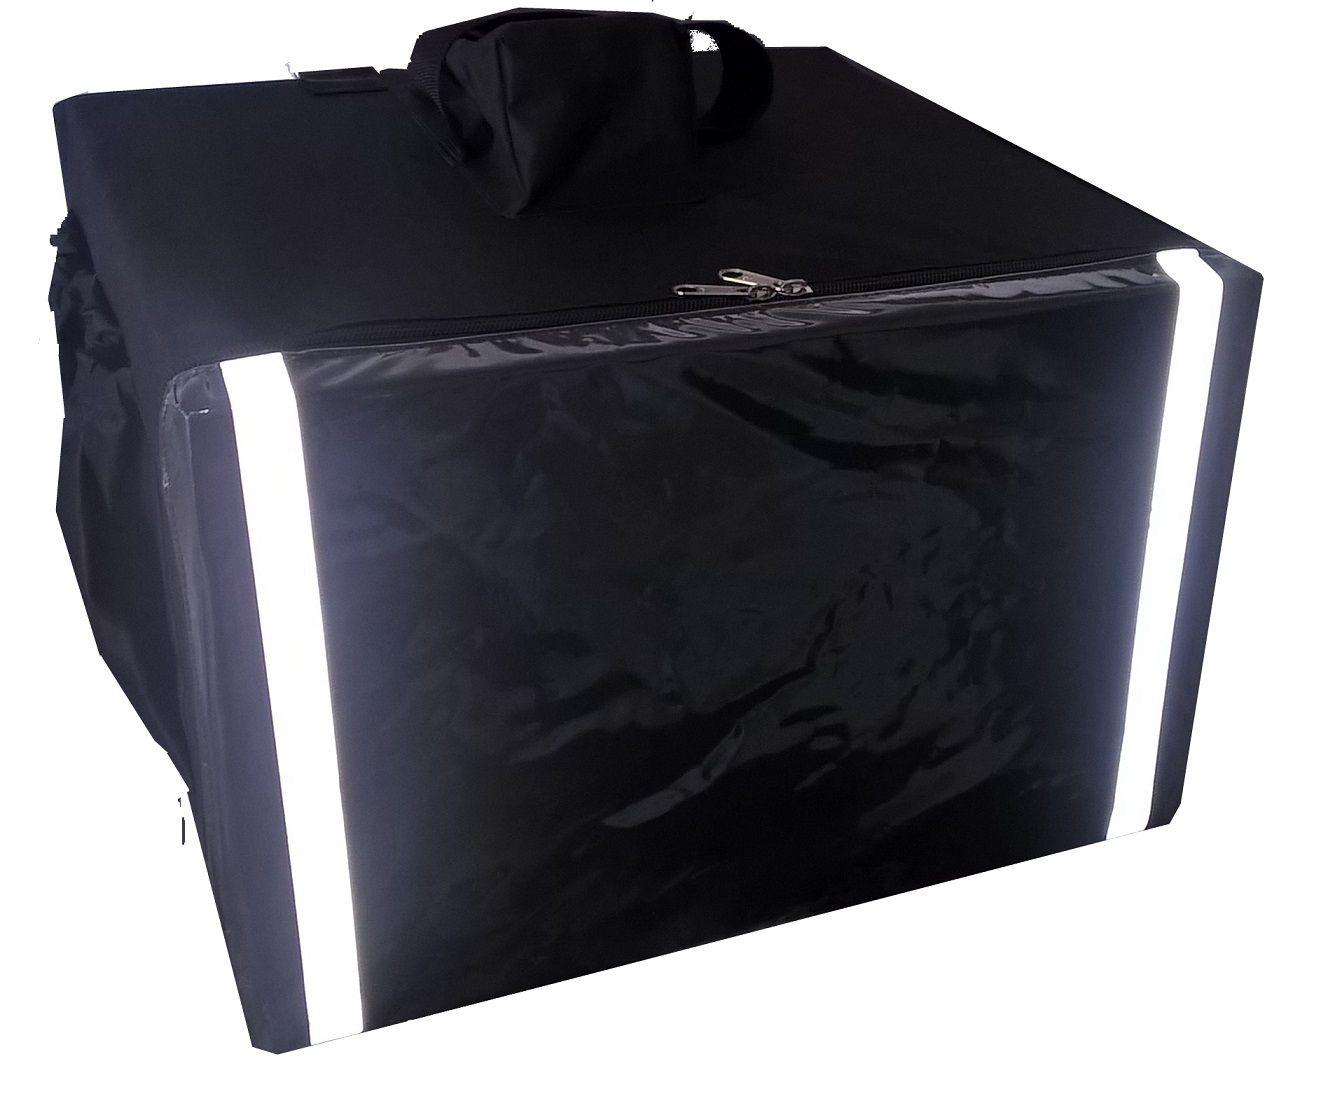 Mochila Bolsa Termica Entrega 20 Marmitex De Alumínio 8/9 20m  - GuerreiroOnline Bolsas e Mochilas para Pizza Lanches Marmitex